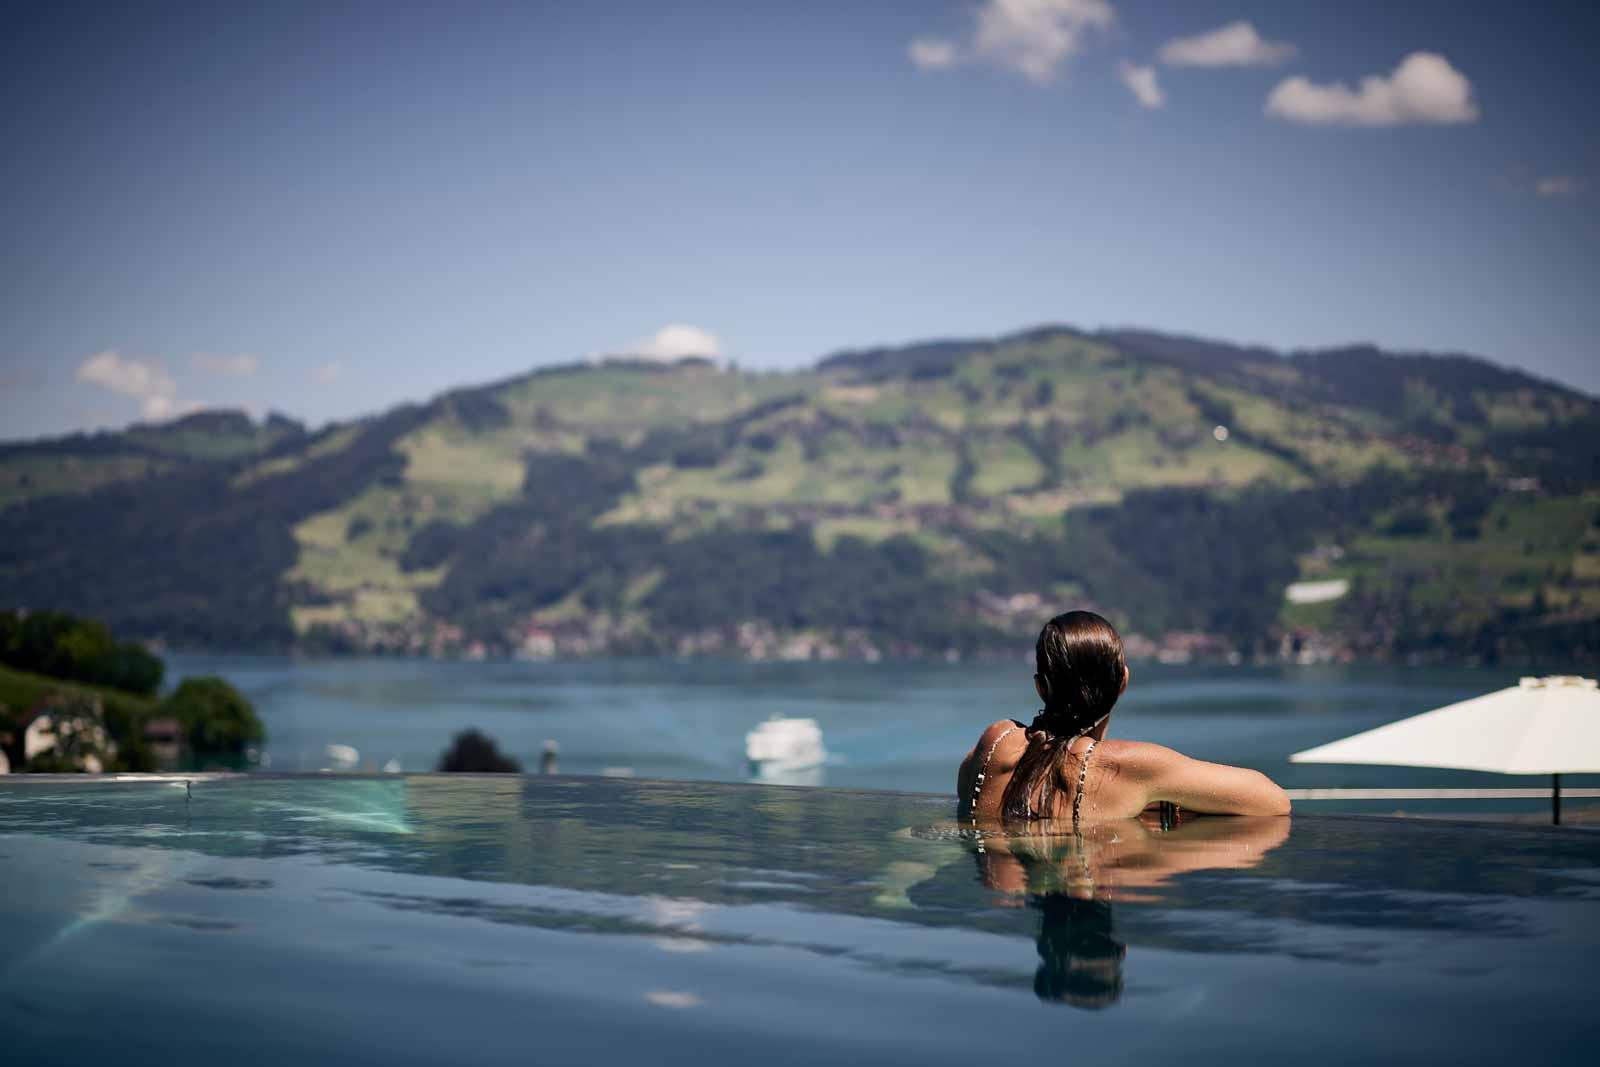 Woman in infinity pool with view of Lake Thun